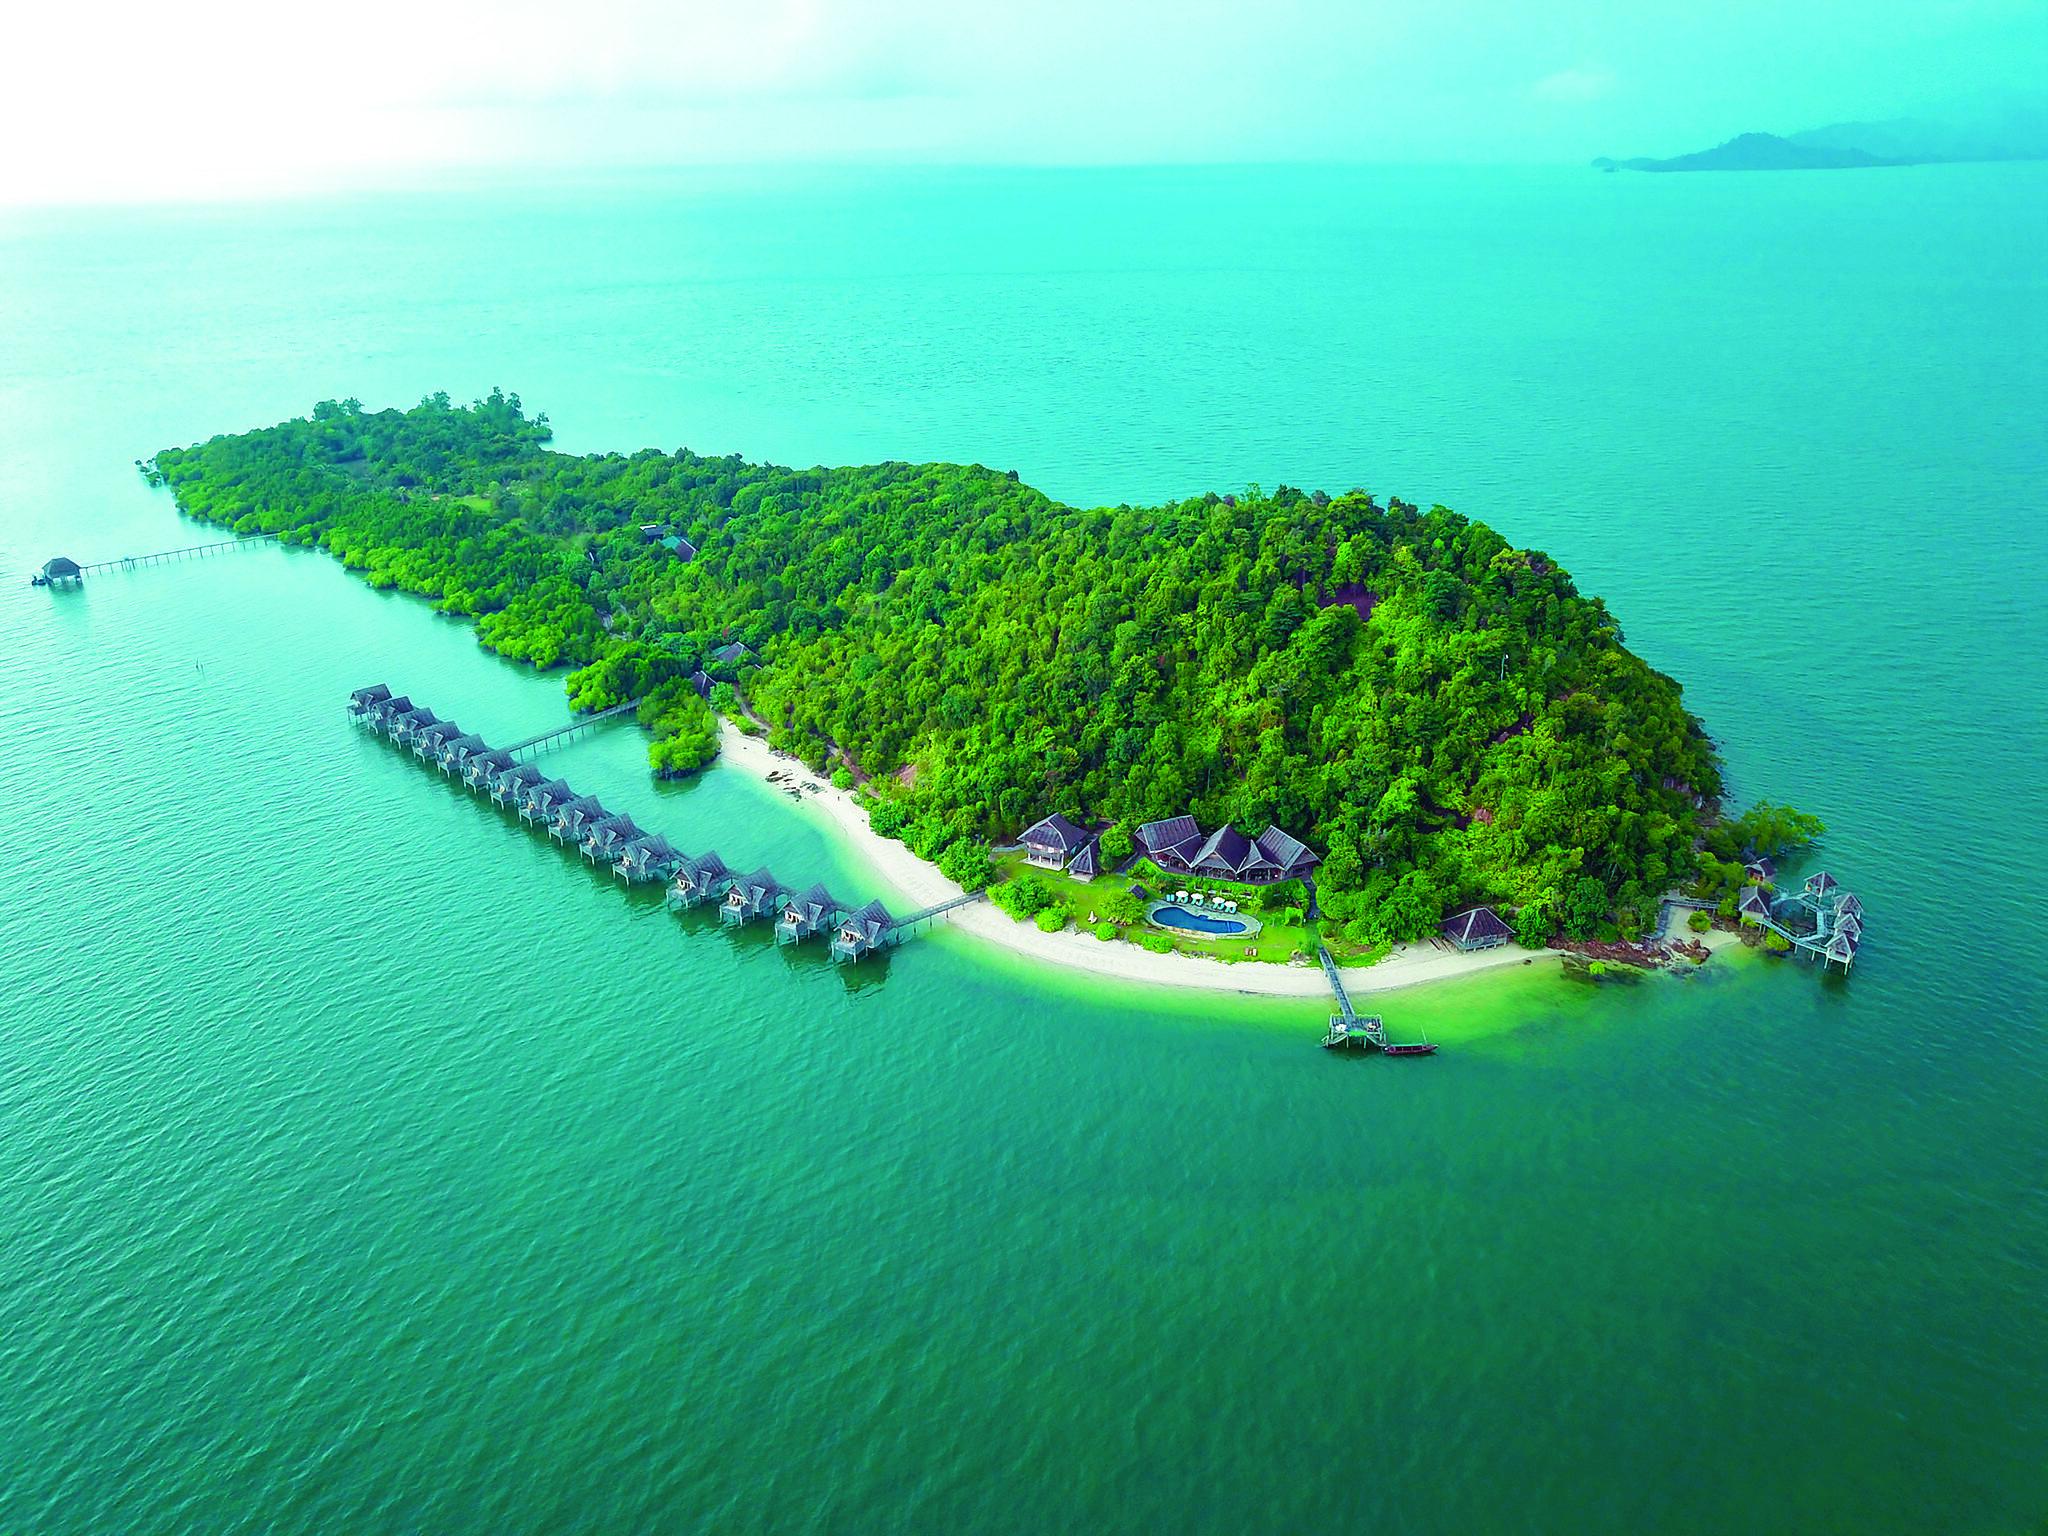 Telunas Private Island Resort, Indonesia (Image courtesy of Telunas Beach Resort)